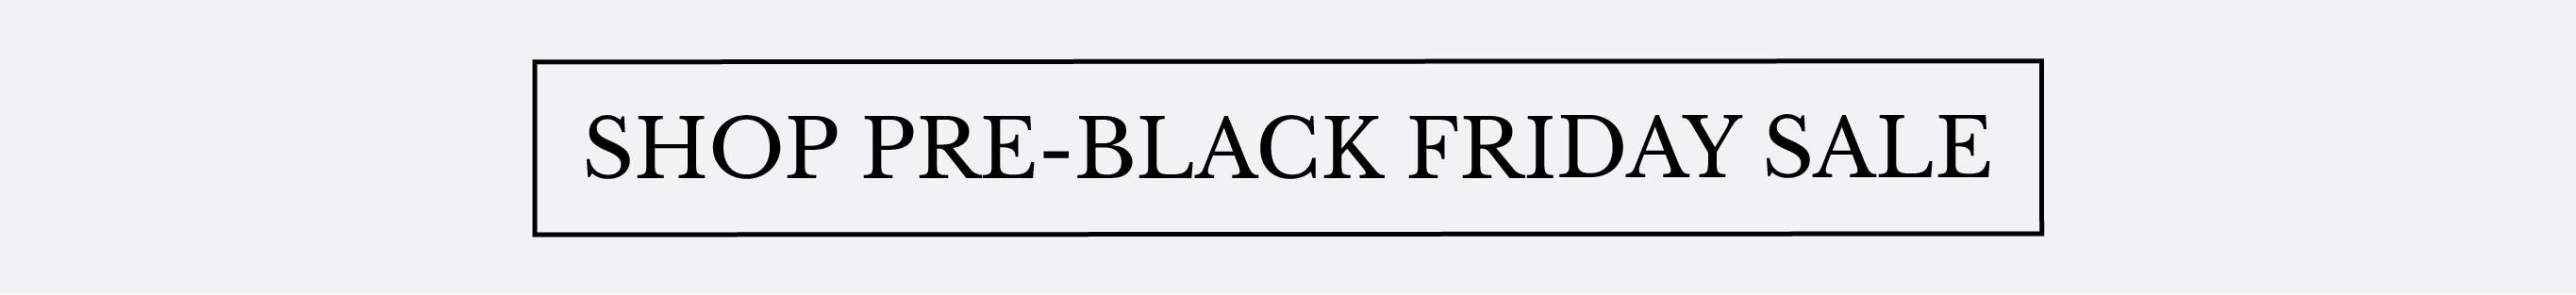 Pre-Black Friday Sale